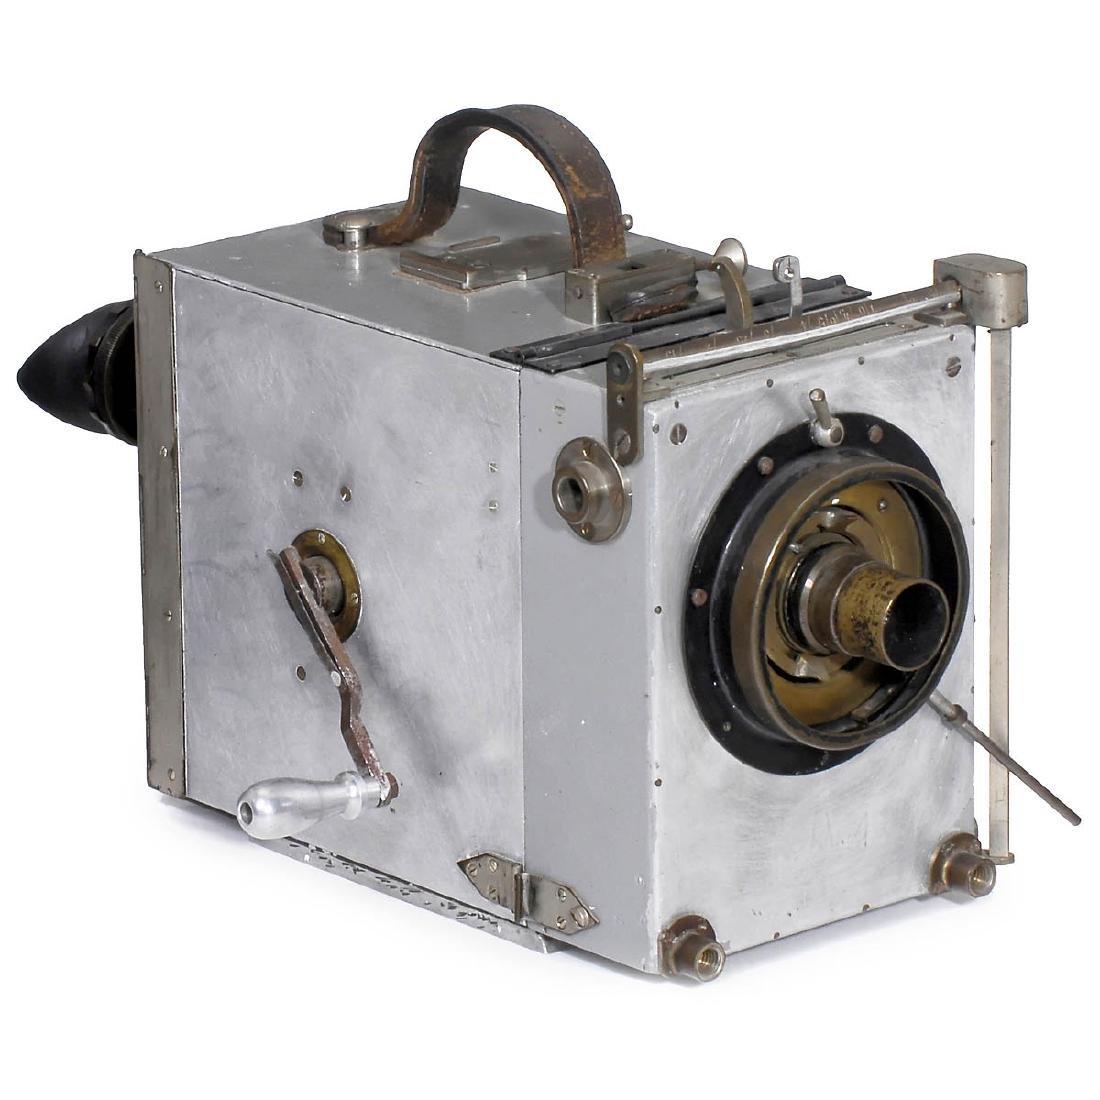 Askania-Universal with 6 Lenses, c. 1924 - 2